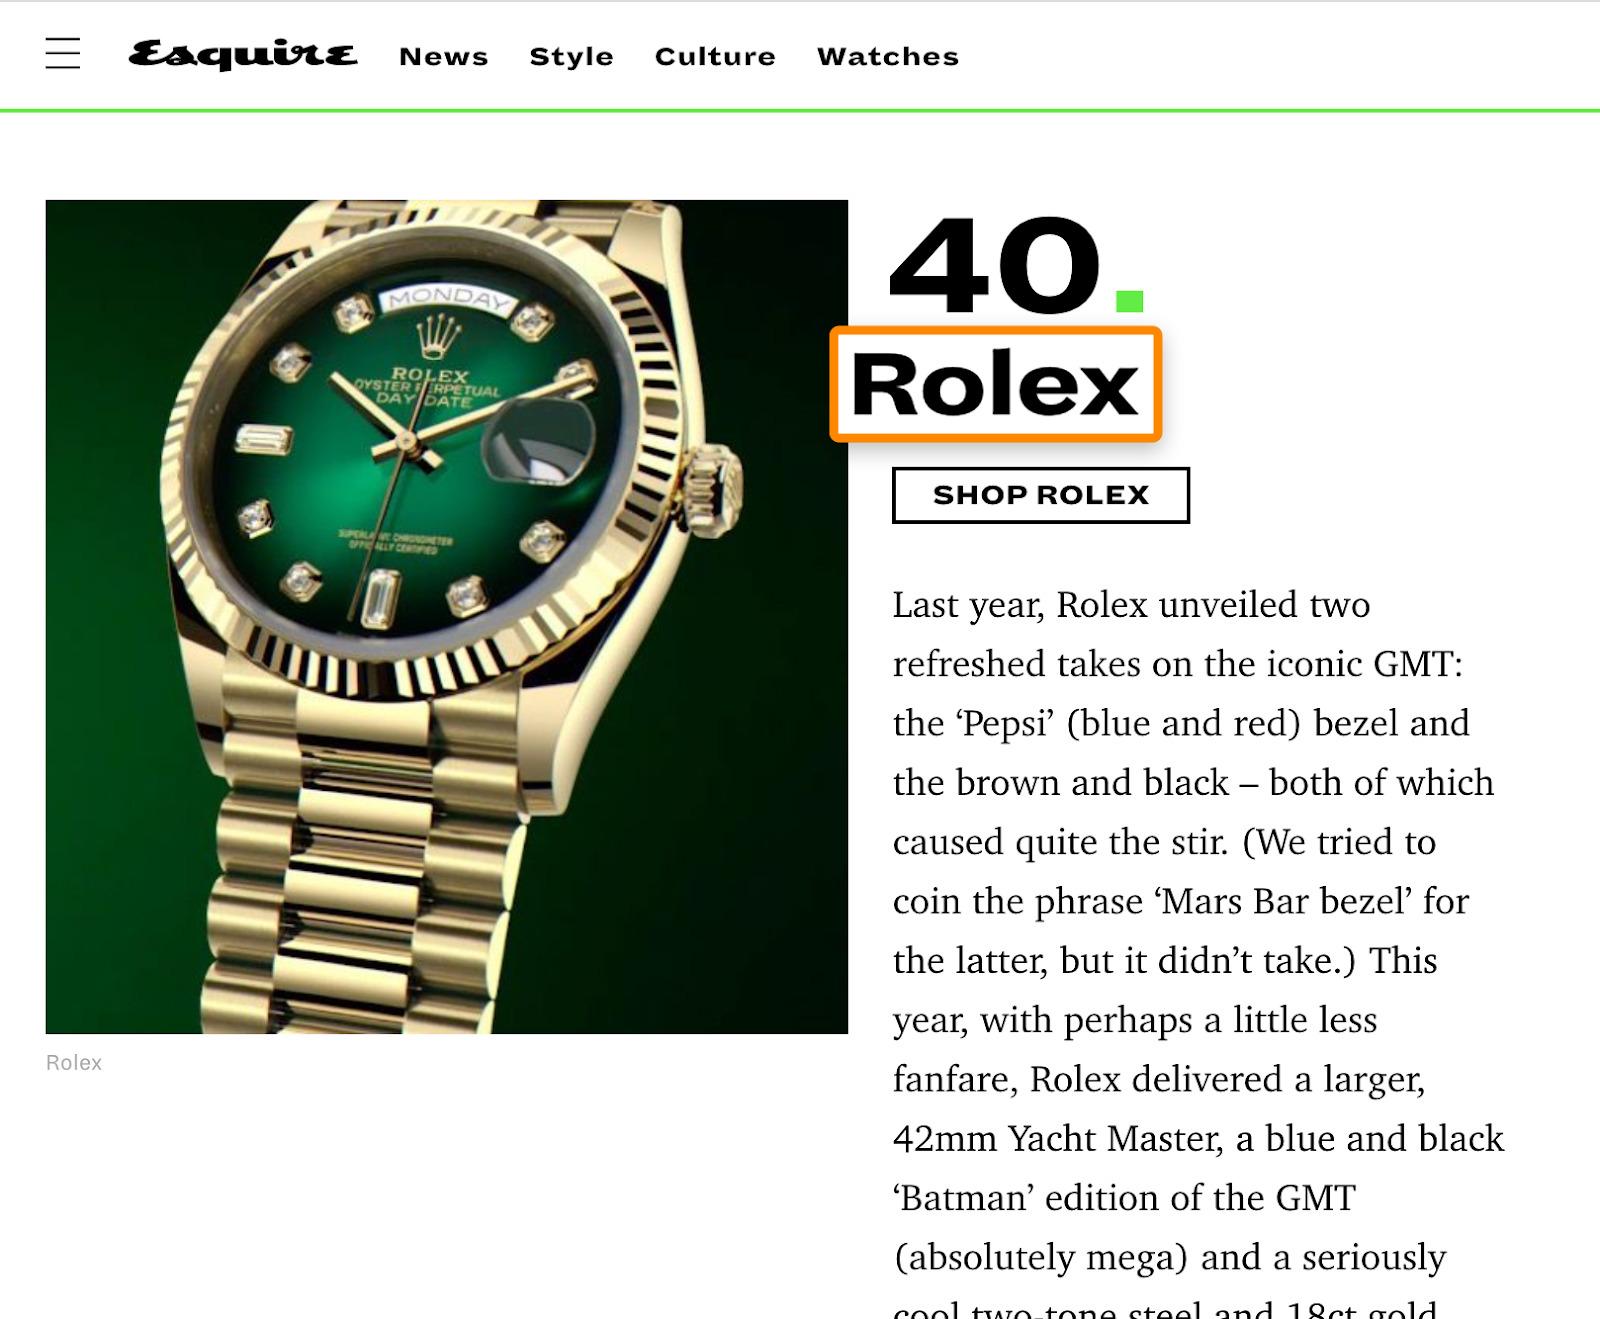 18 rolex brand